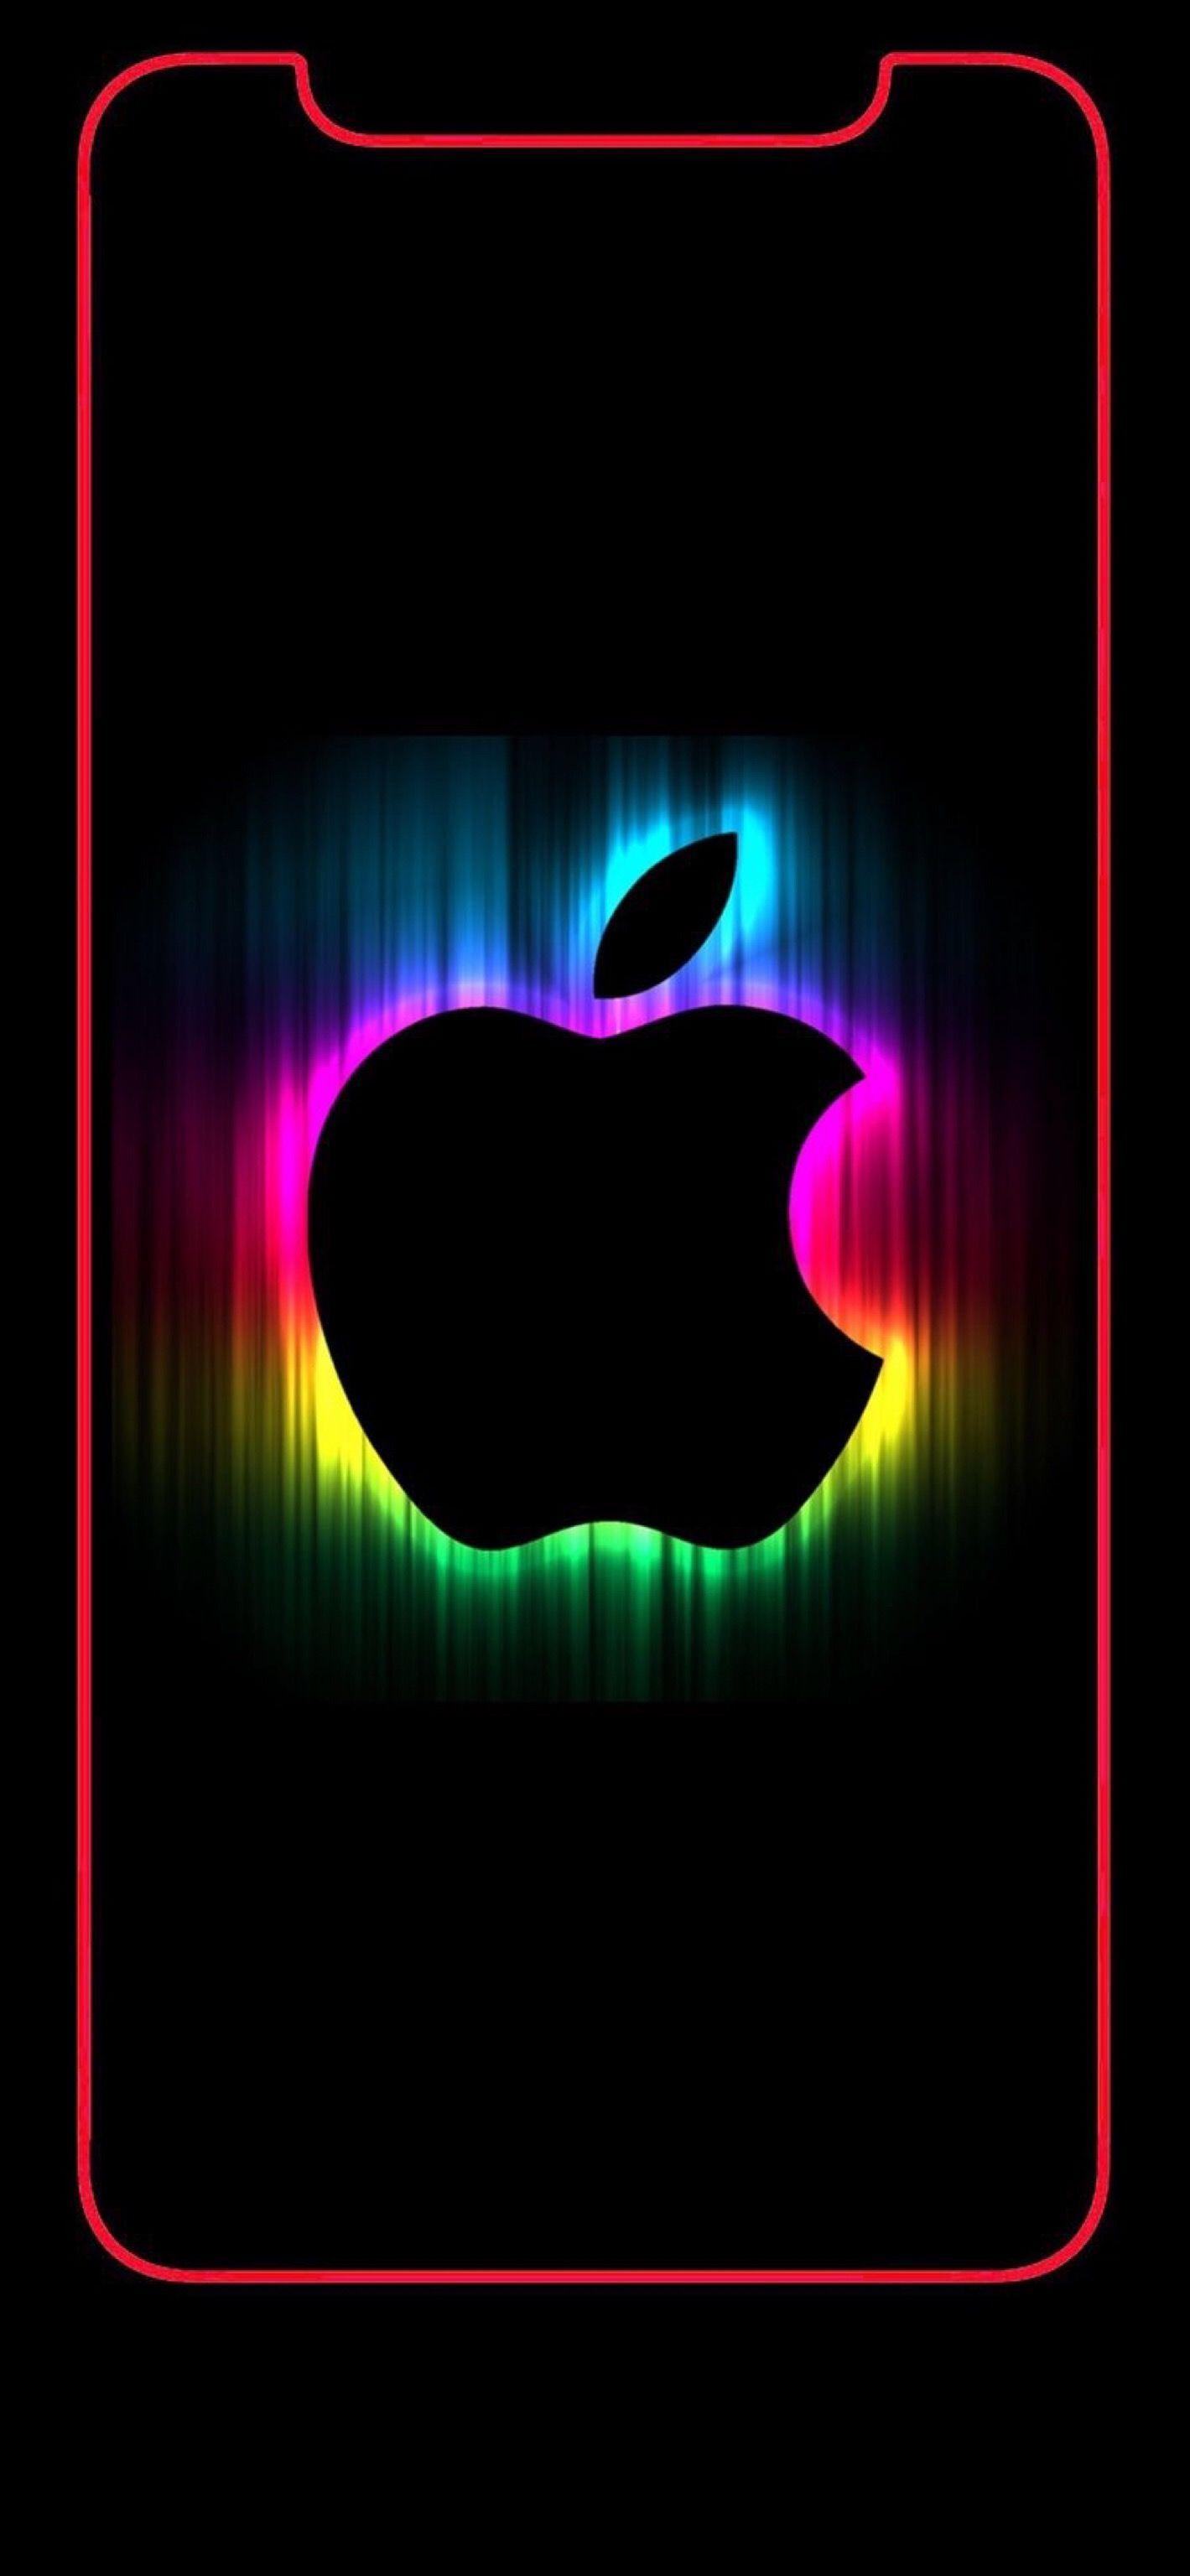 Apple Wallpapers 4k Hd Apple Backgrounds On Wallpaperbat